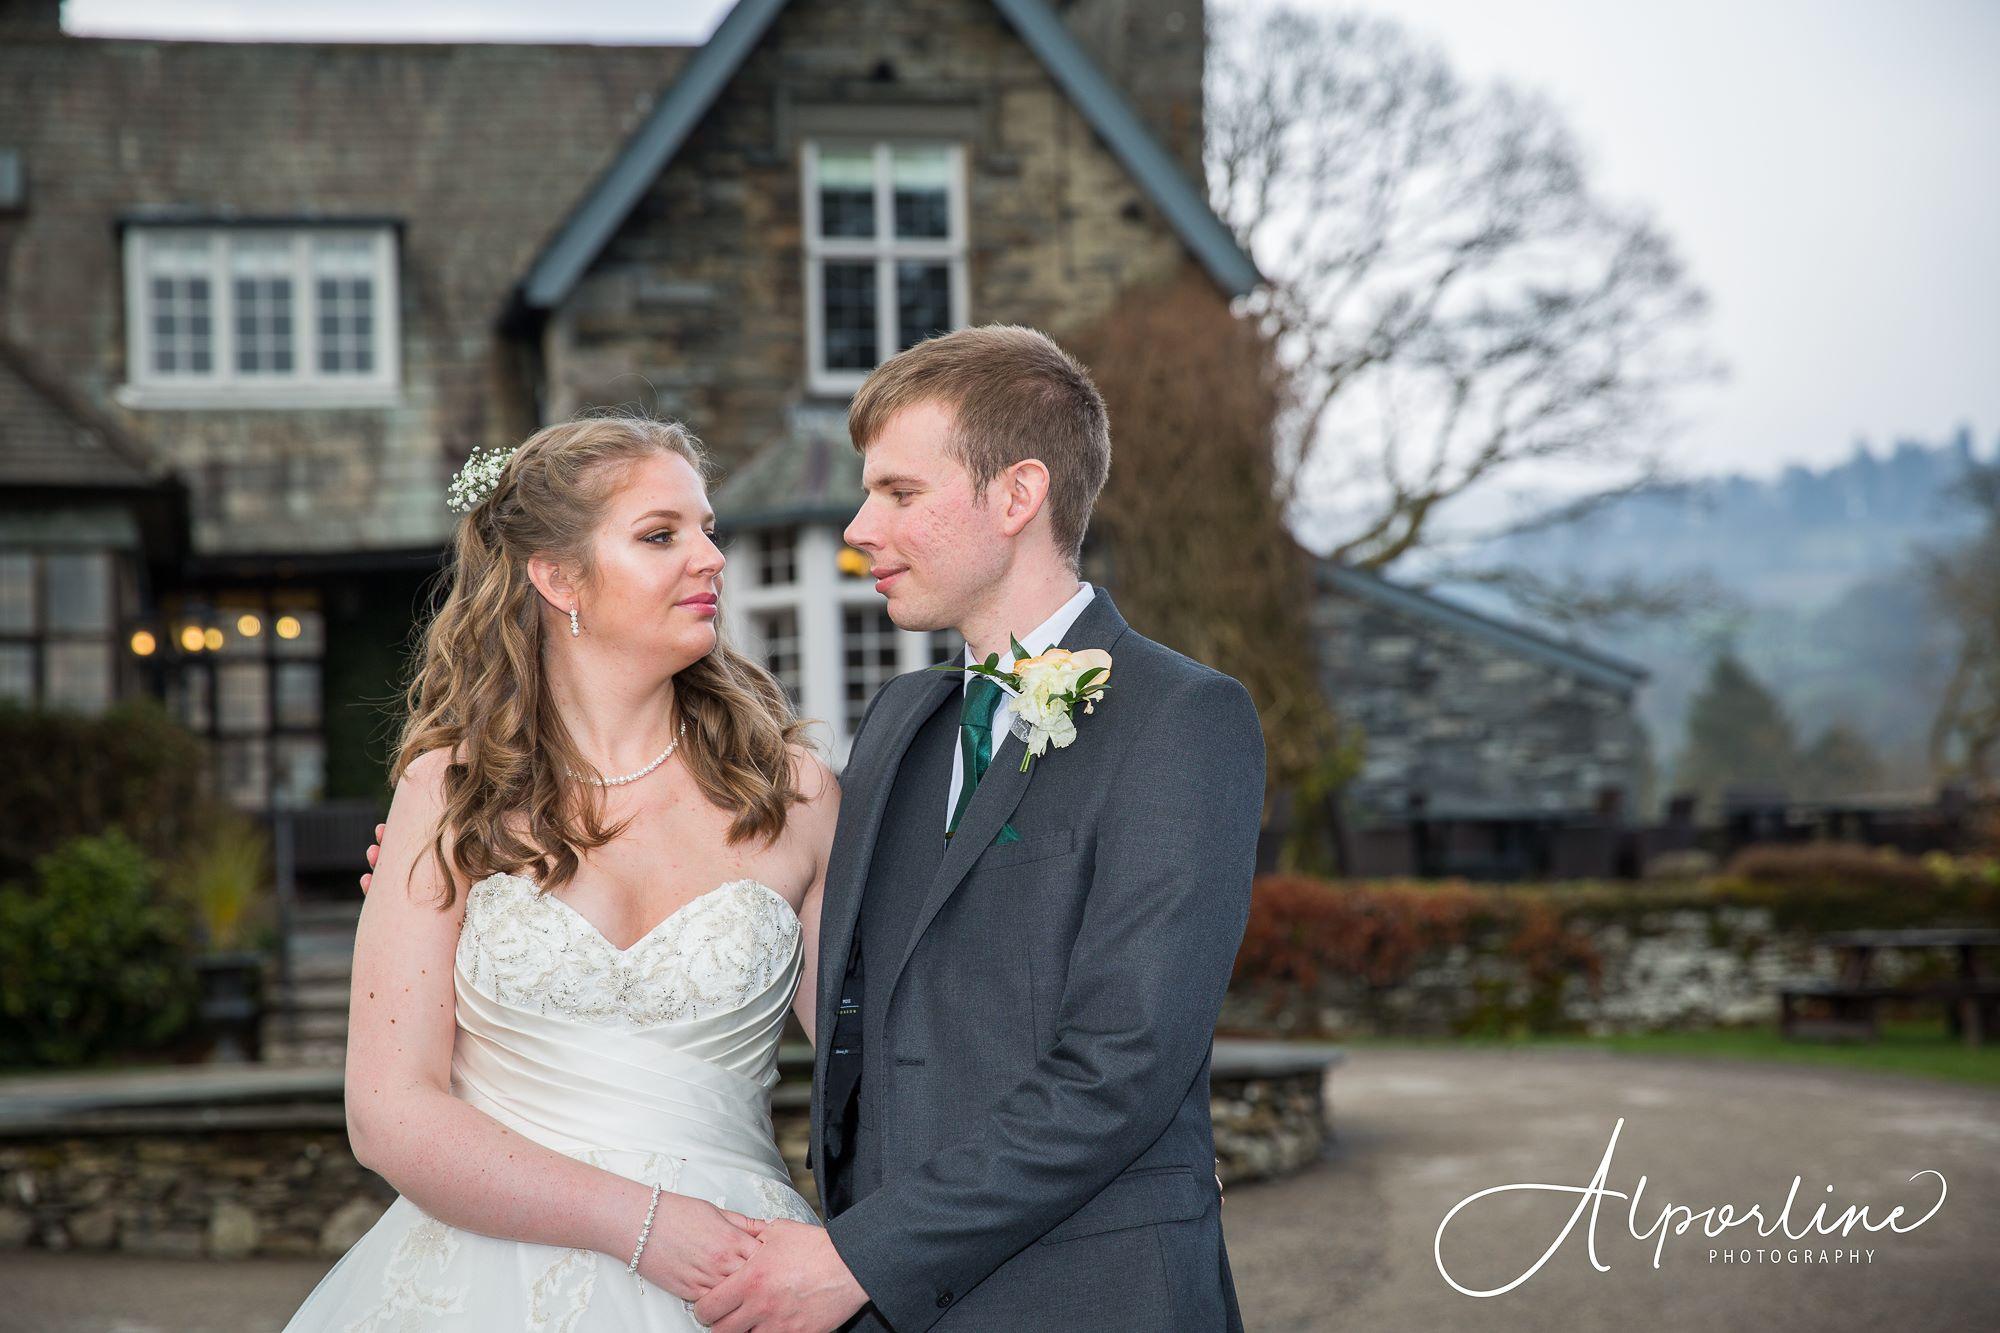 Broadoaks-country-hotel-wedding-photograph-windermere-wedding-photographer.